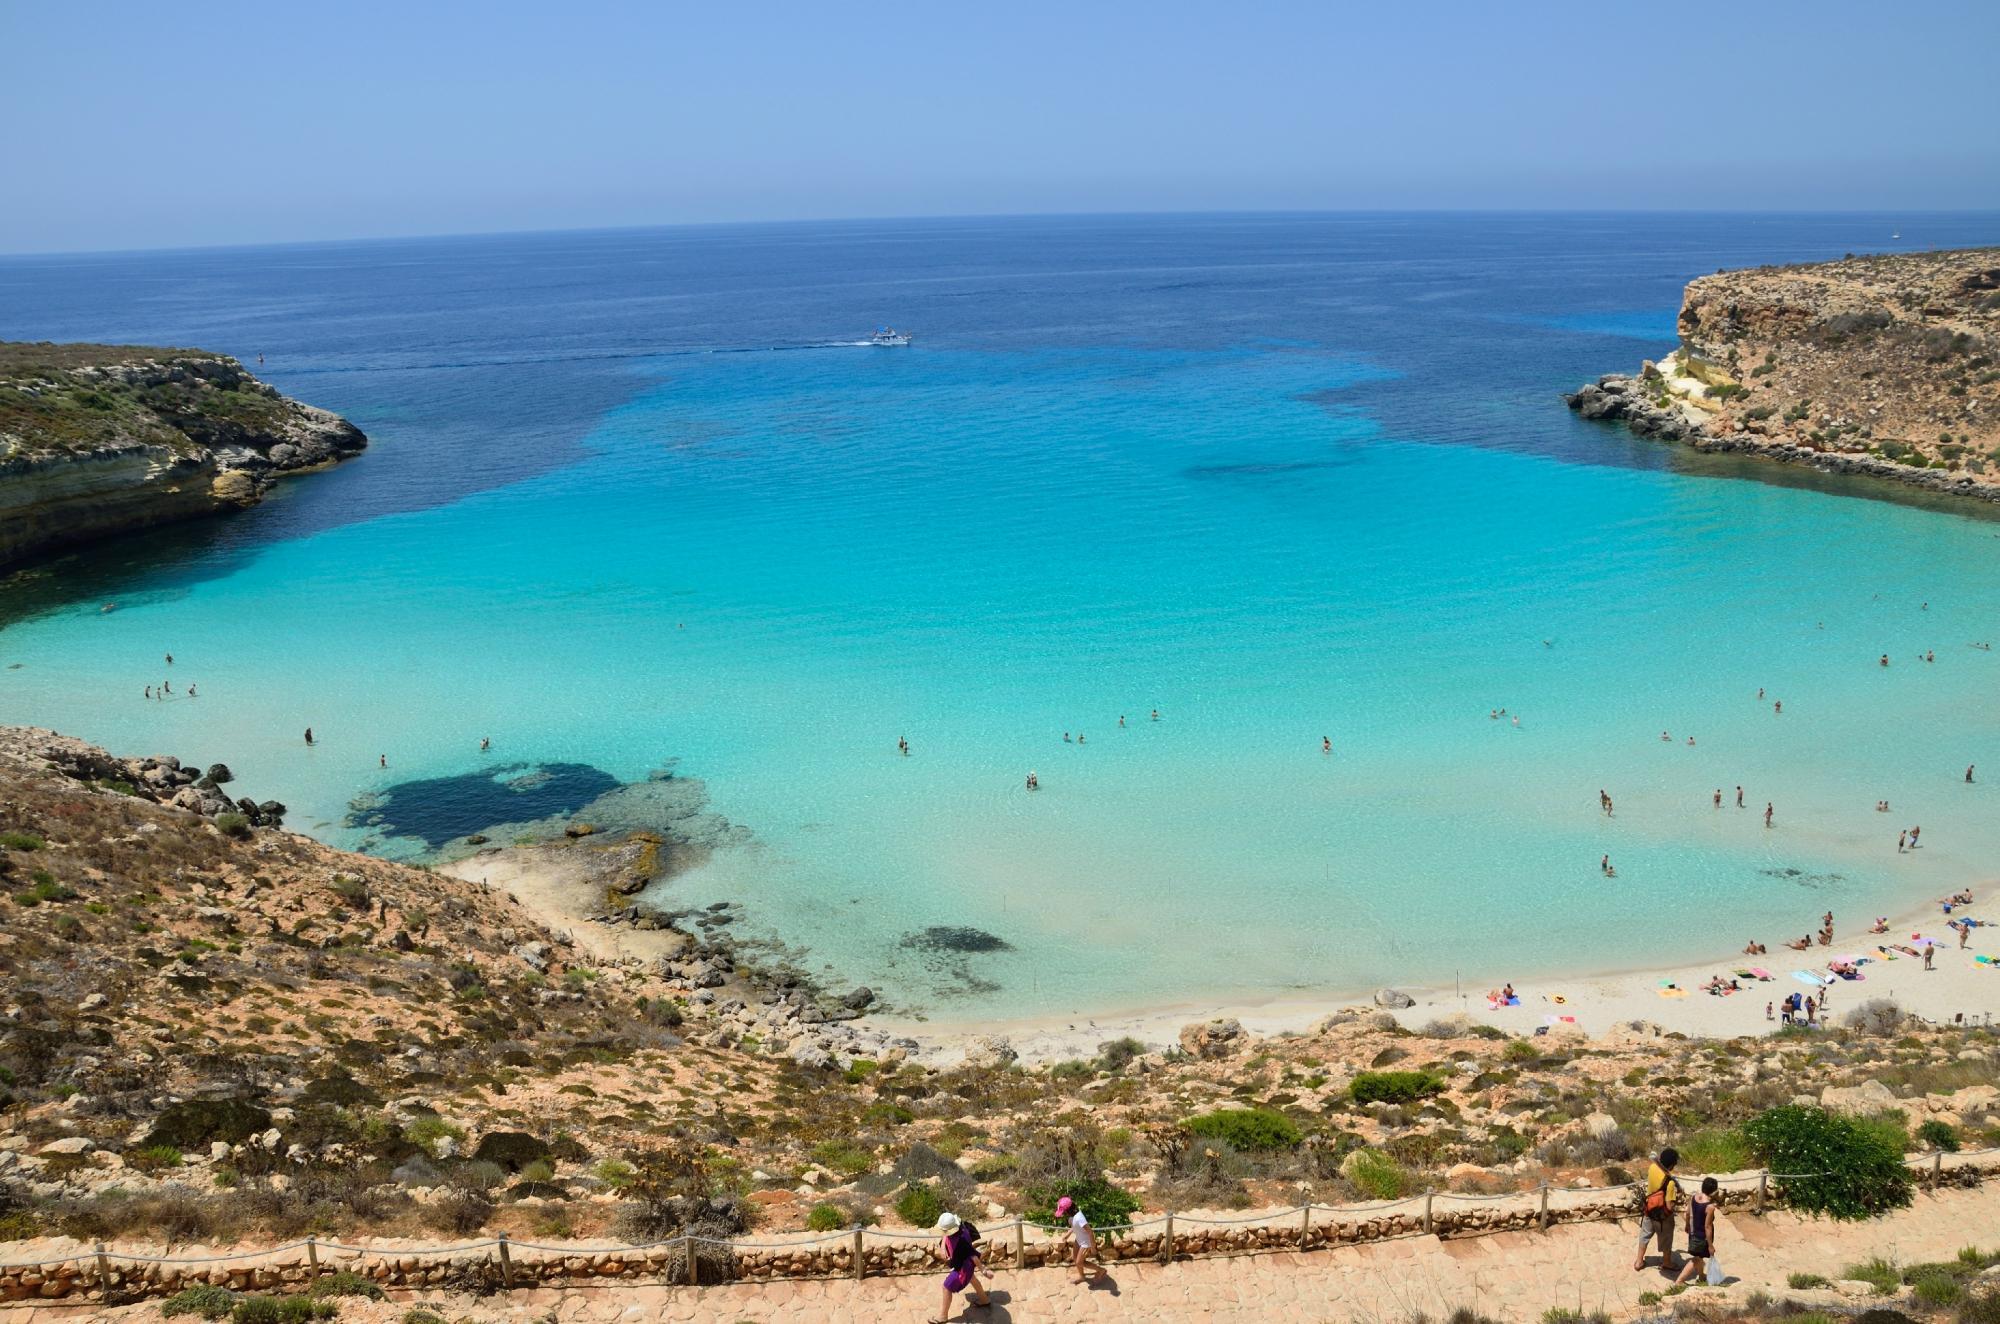 2013-Travelers-Choice-Beaches-Awards-Top-25-World-Rabbit-Beach-Lampedusa-Italy